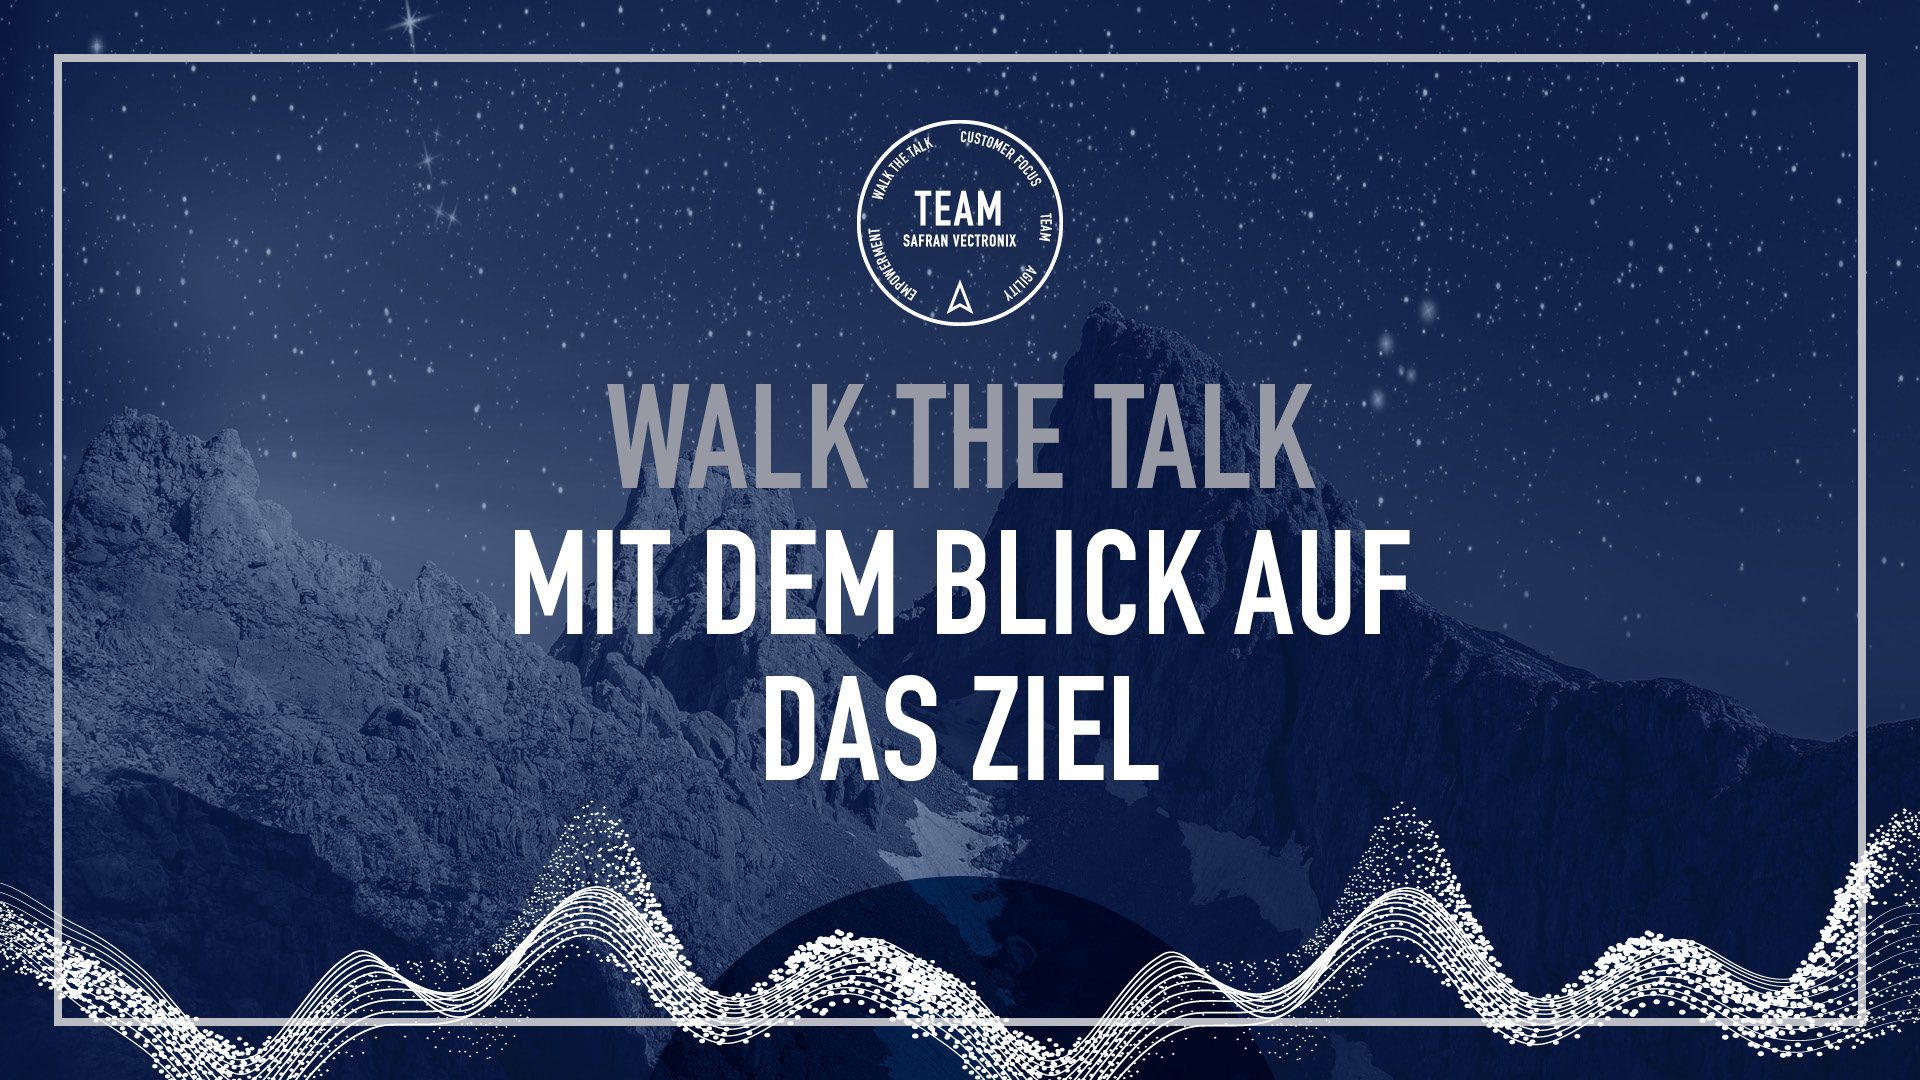 safran vectronix values walk-the-talk